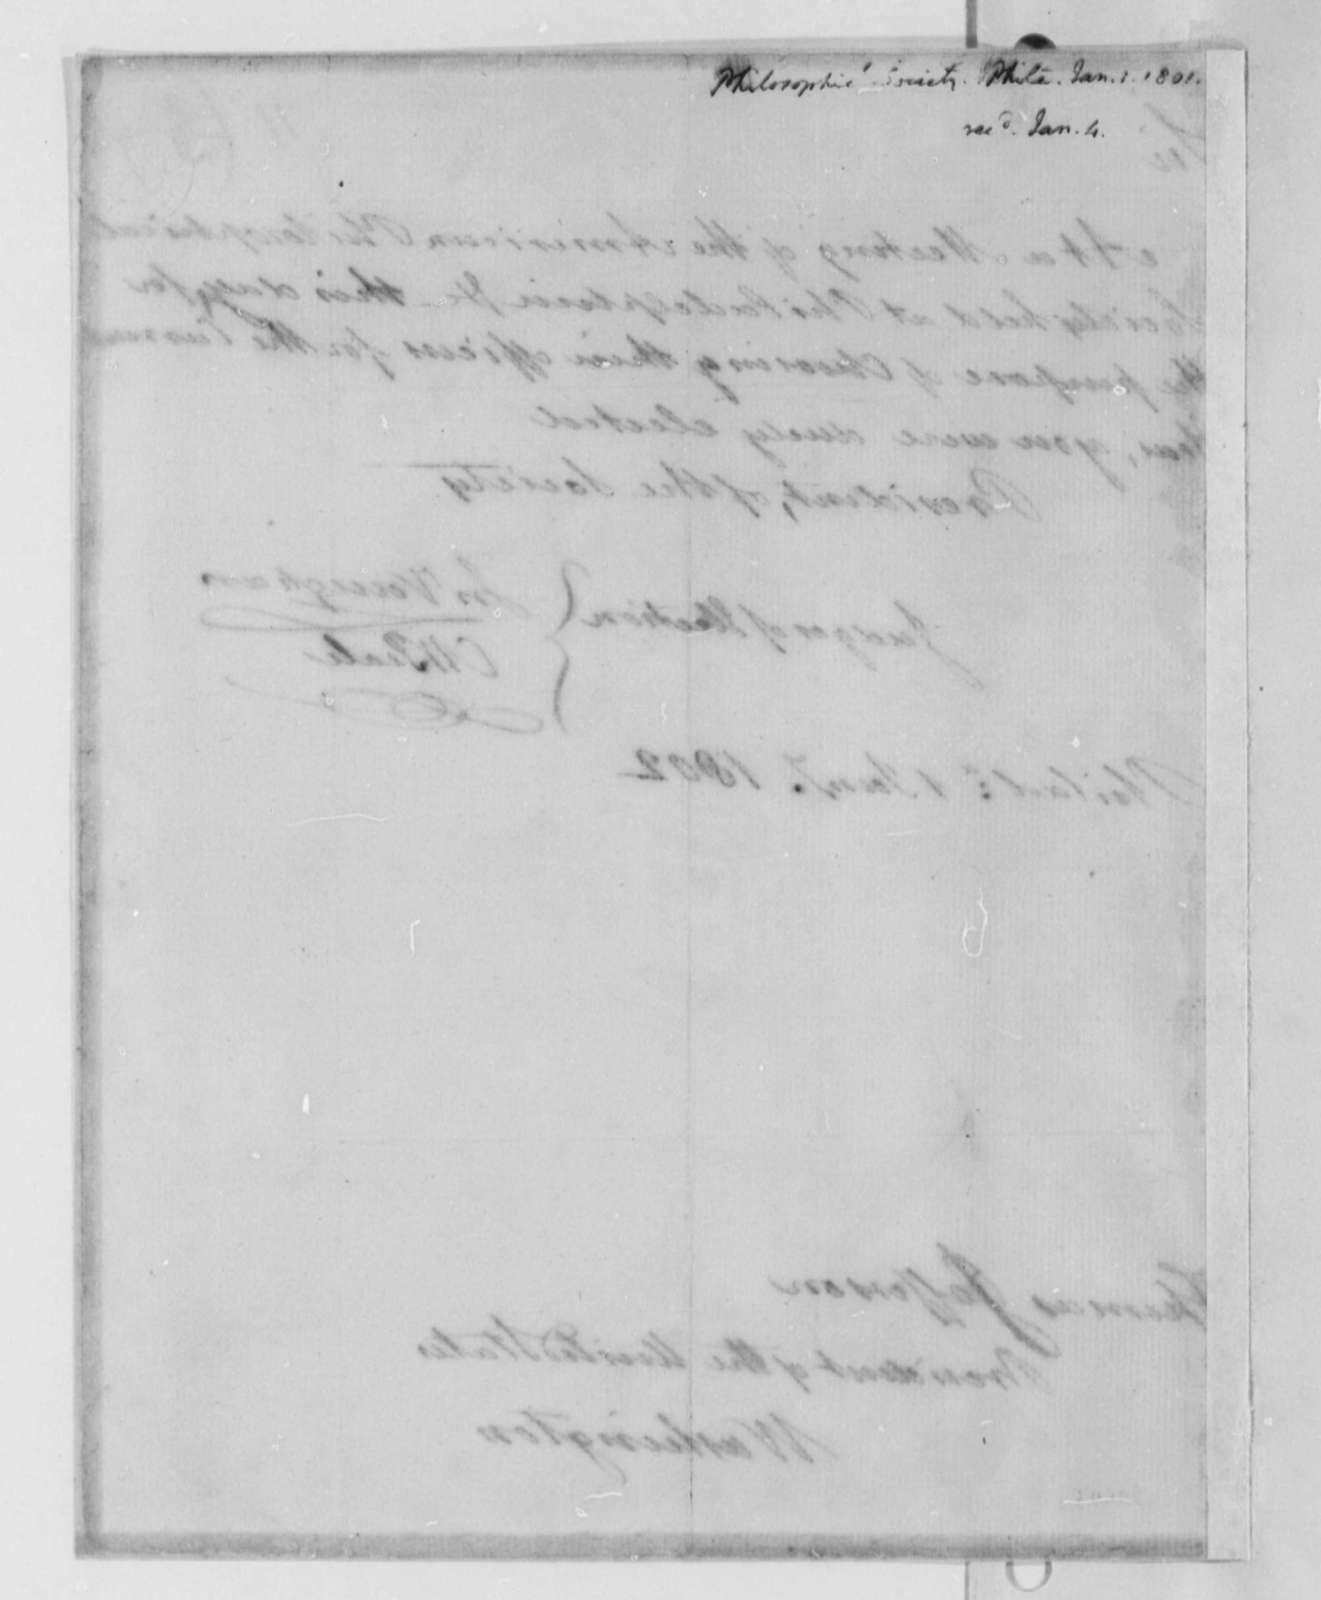 American Philosophical Society to Thomas Jefferson, January 1, 1802, Notice